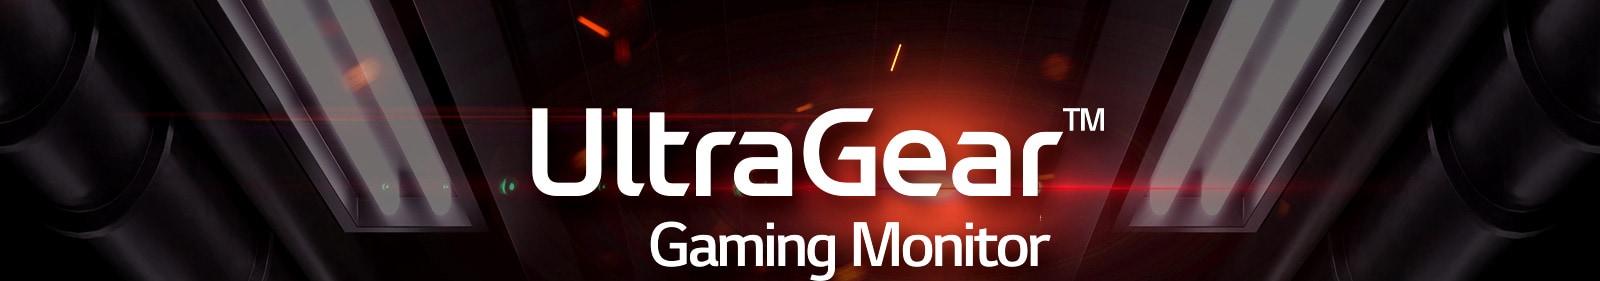 Gaming monitor UltraGear ™